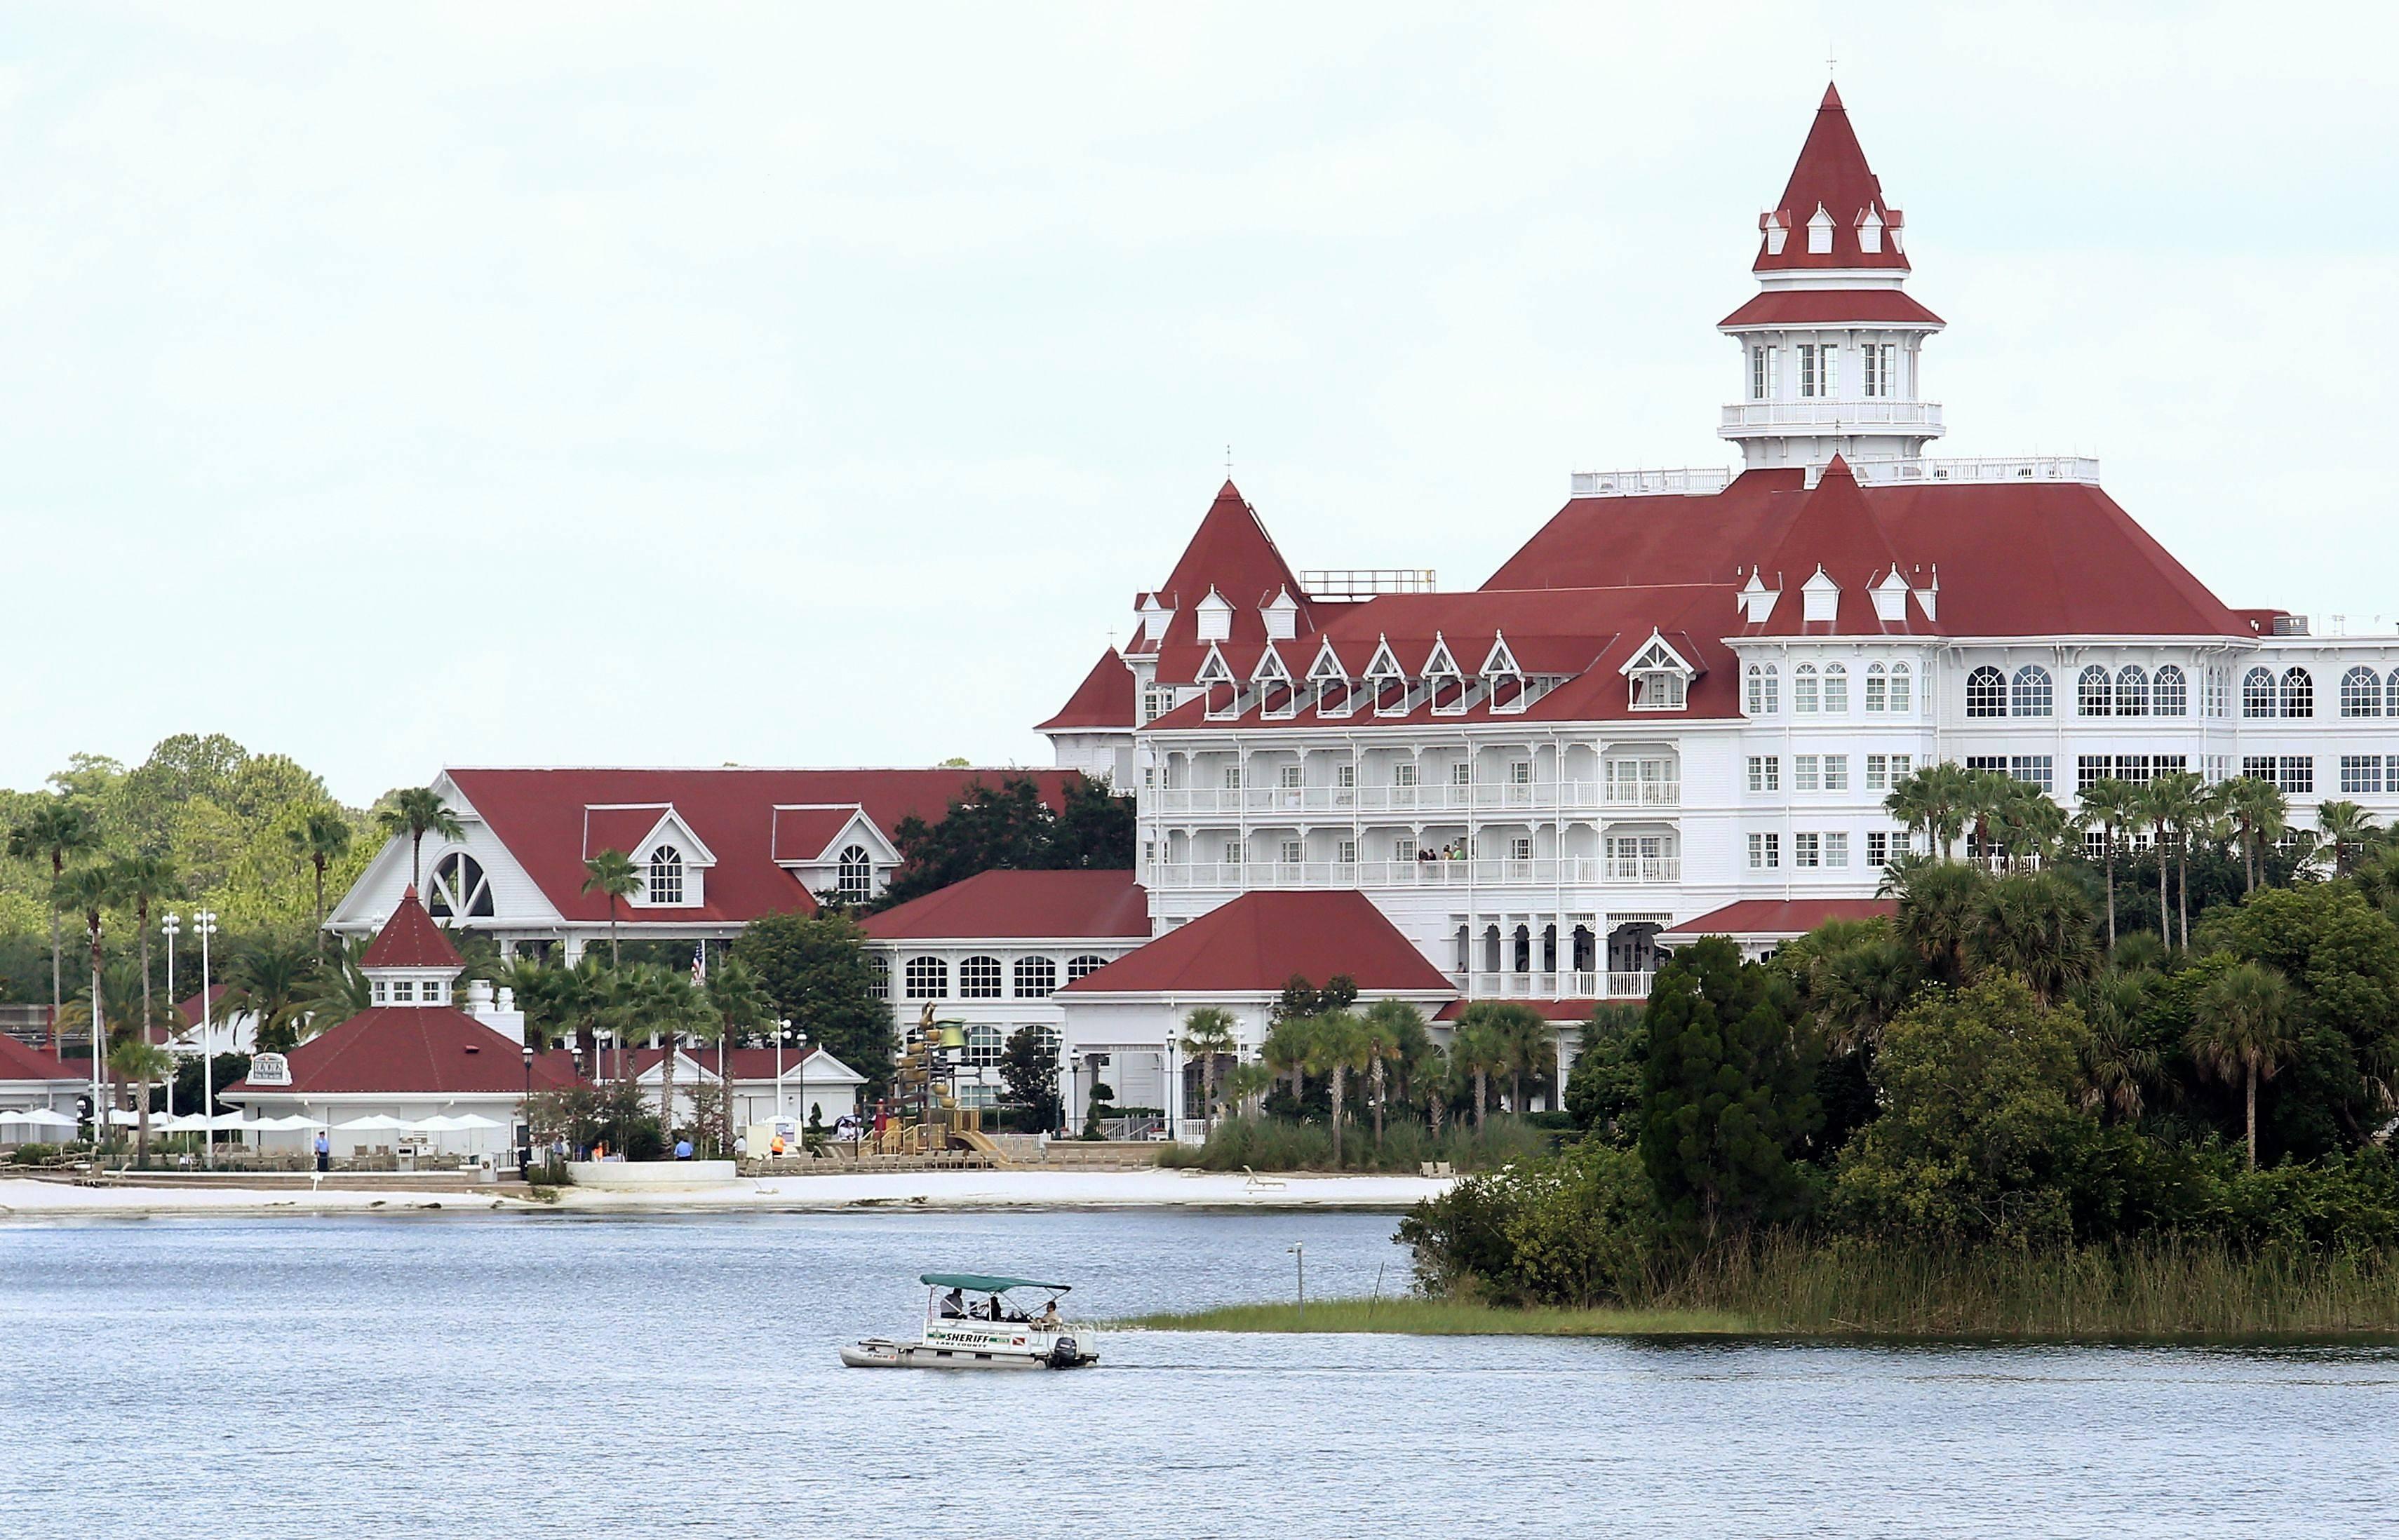 Disney World Hotel in Florida